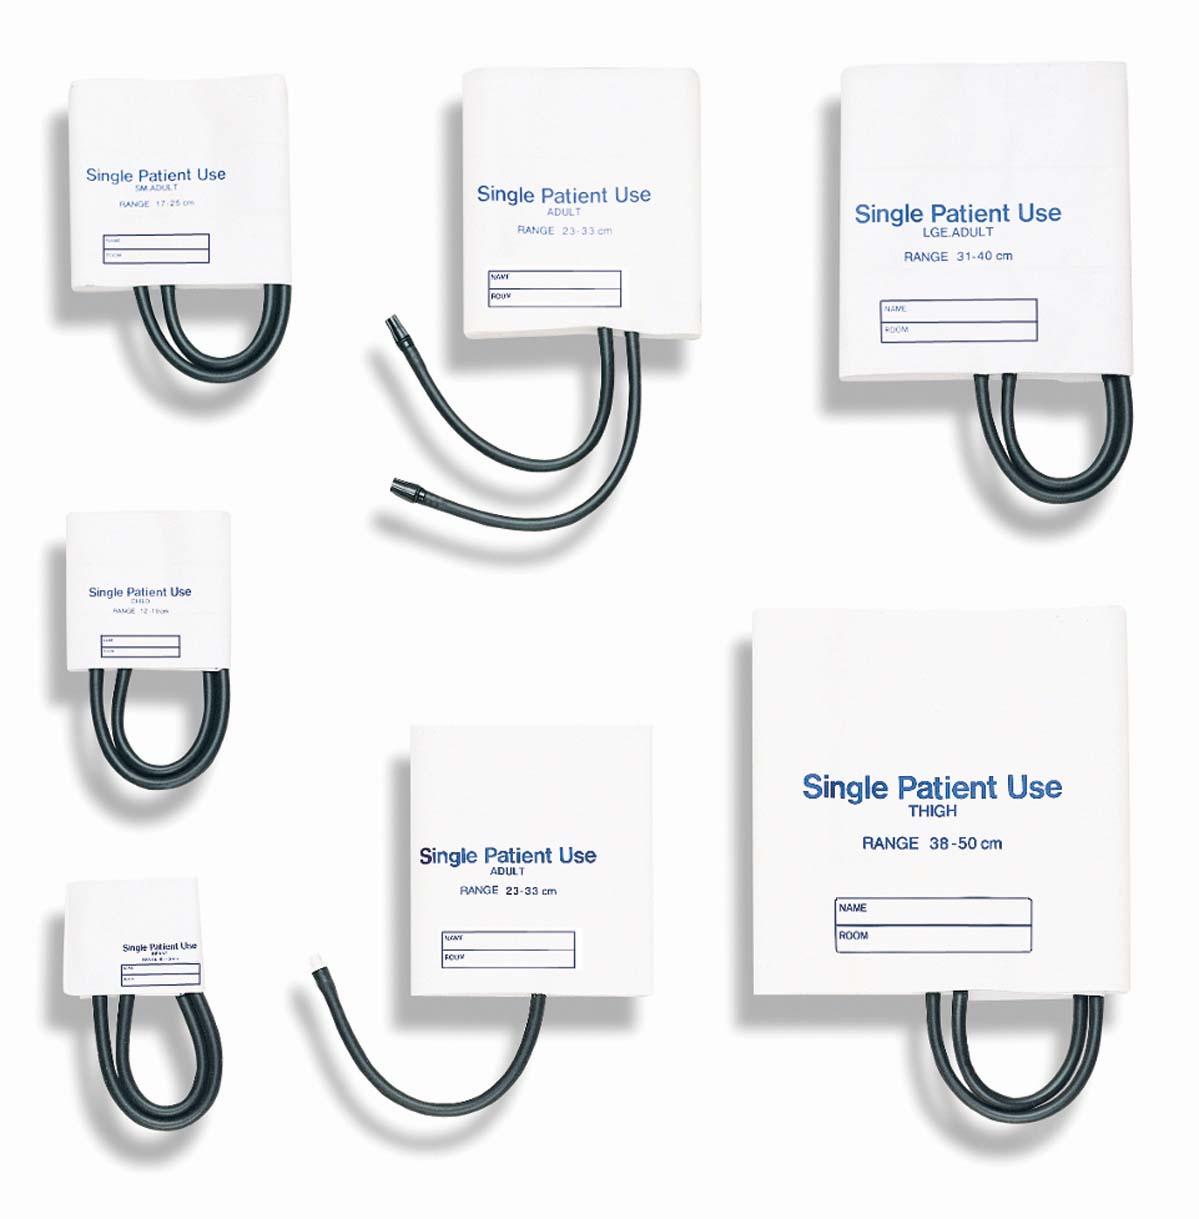 single-patient-use-sphygmomanometer-adult-yellow-5-box-06-148-131-lr-3.jpg